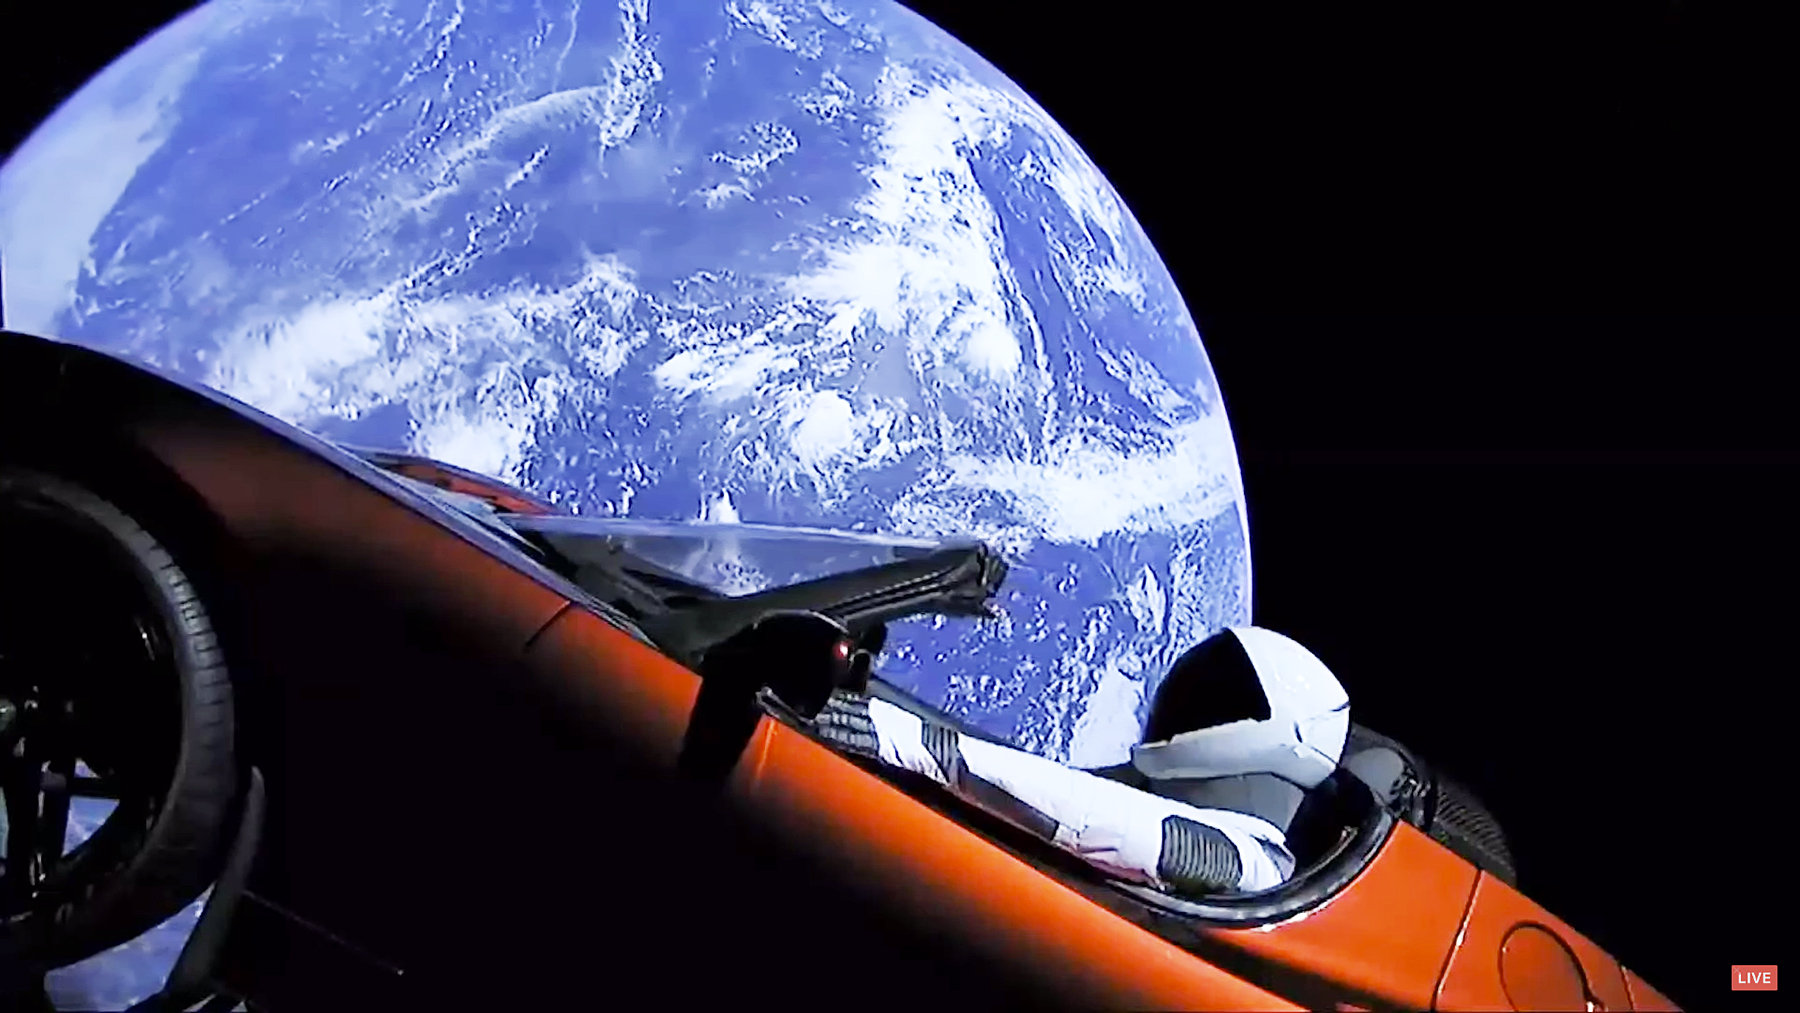 Elon Musk Tesla space